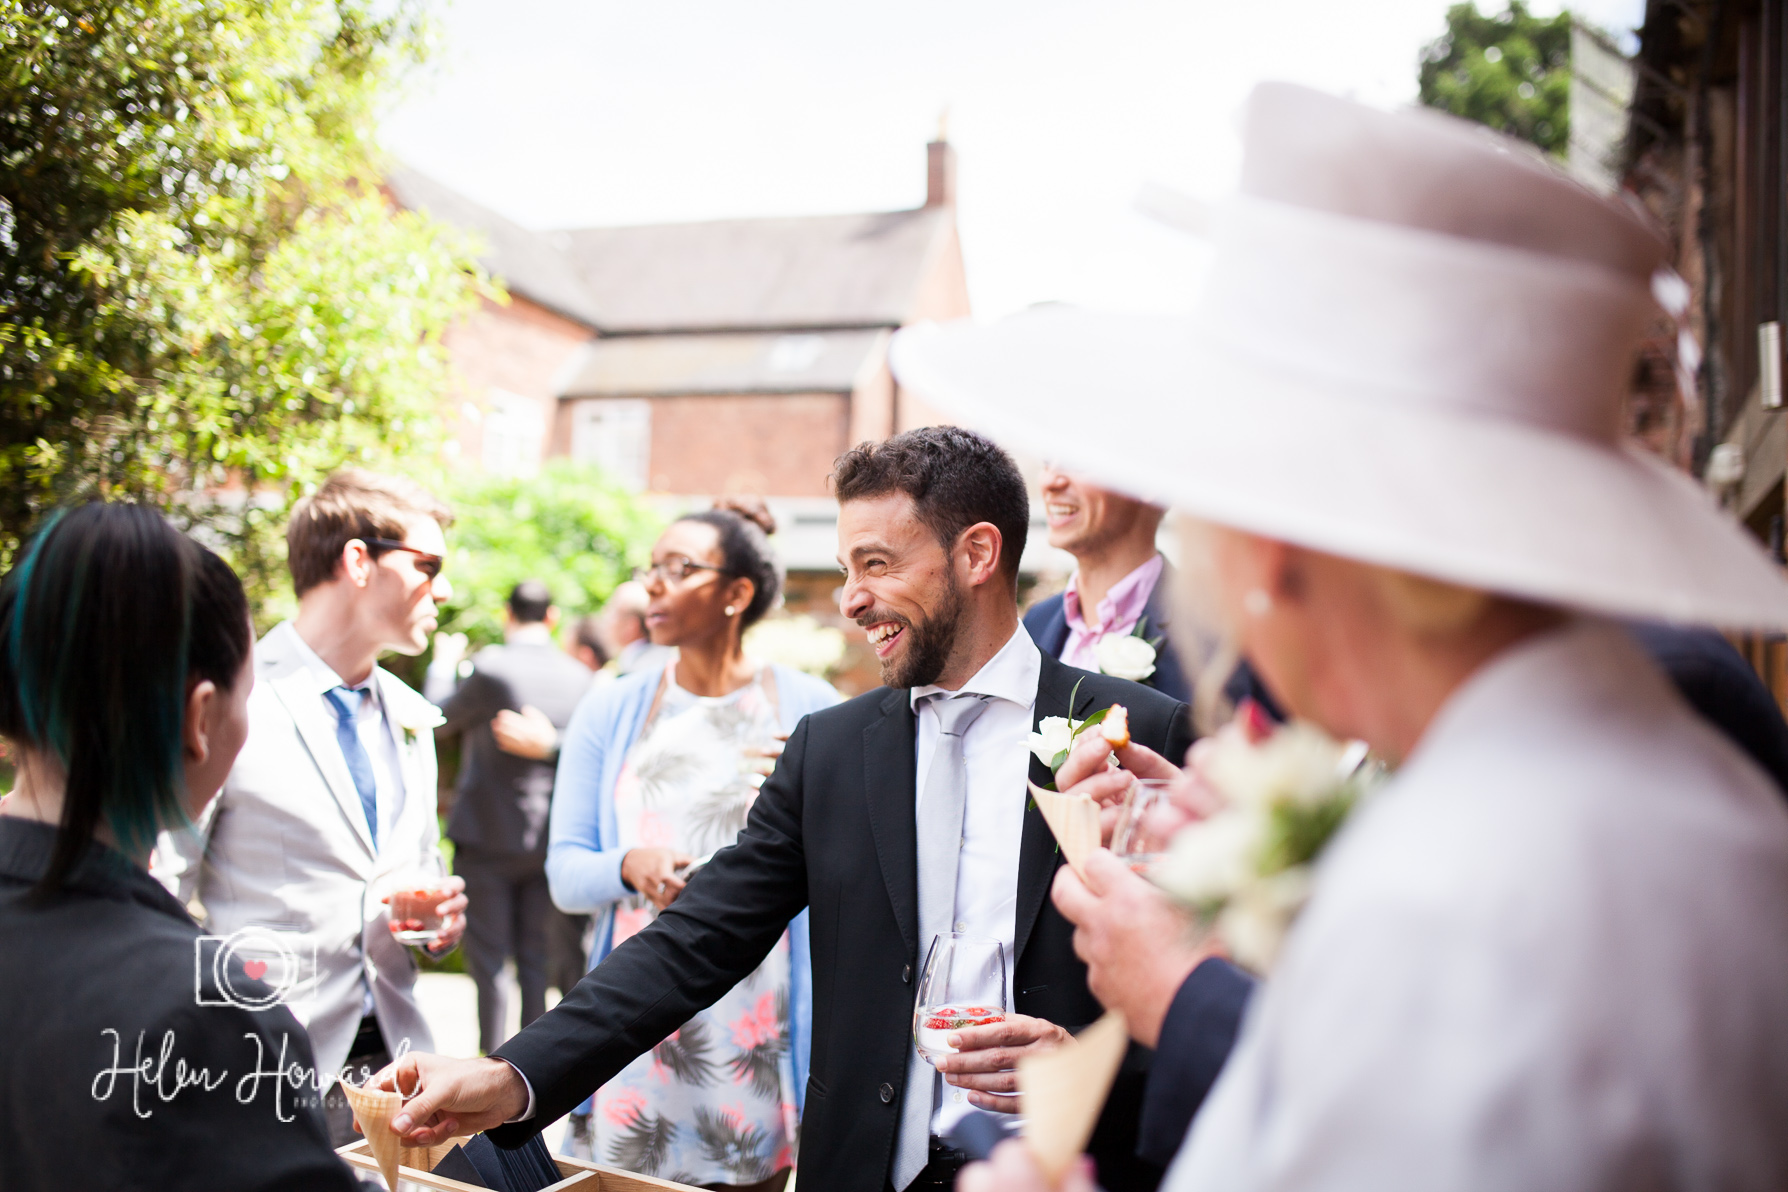 Helen Howard Photography Packington Moor Wedding-69.jpg